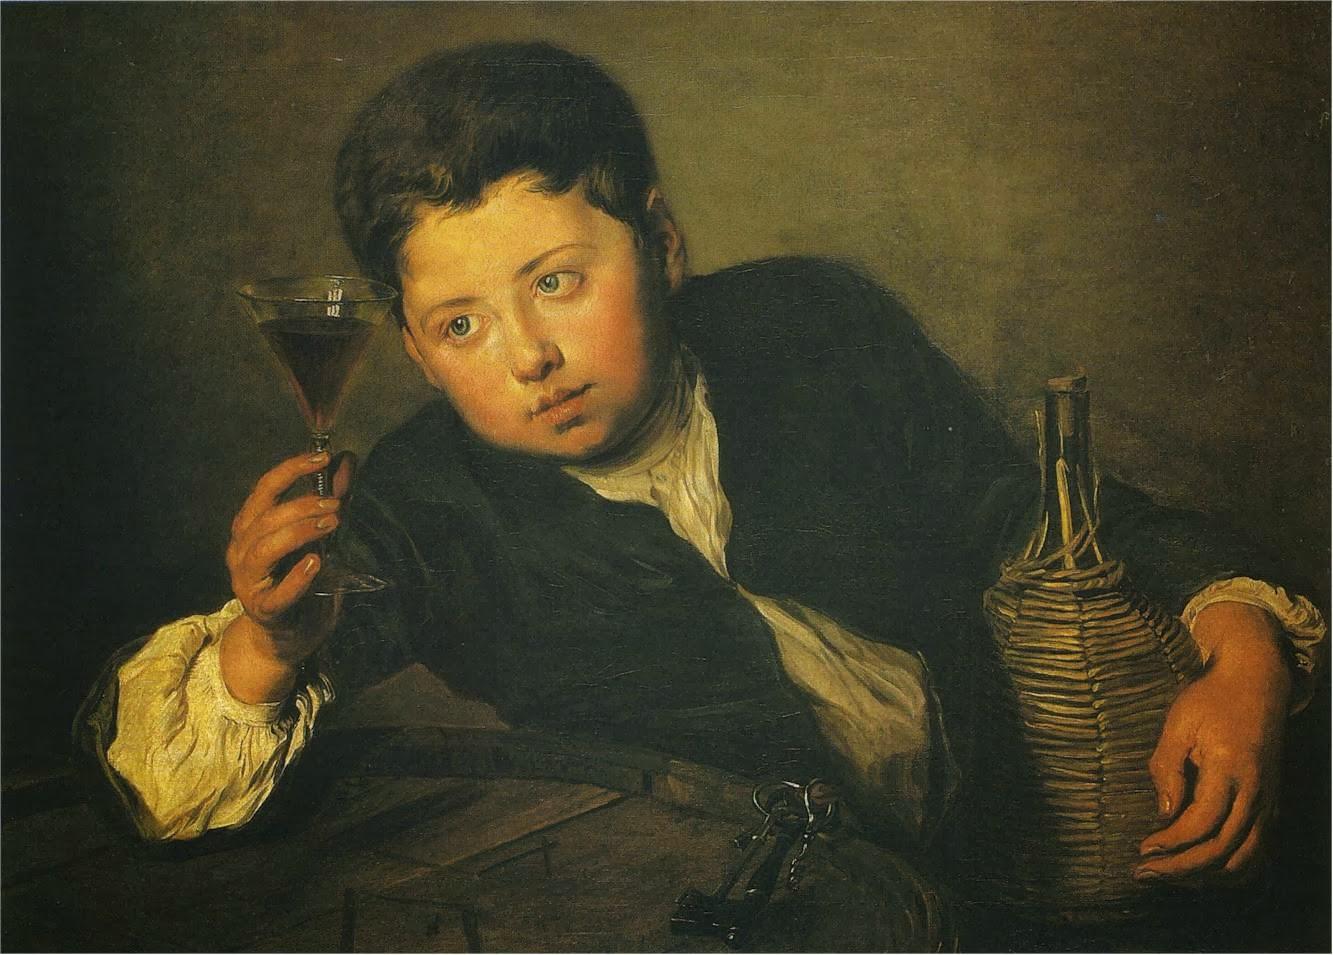 Philippe Mercier Femme au Verre de Vin フィリップ・メルシエ ワイングラスを持つ女